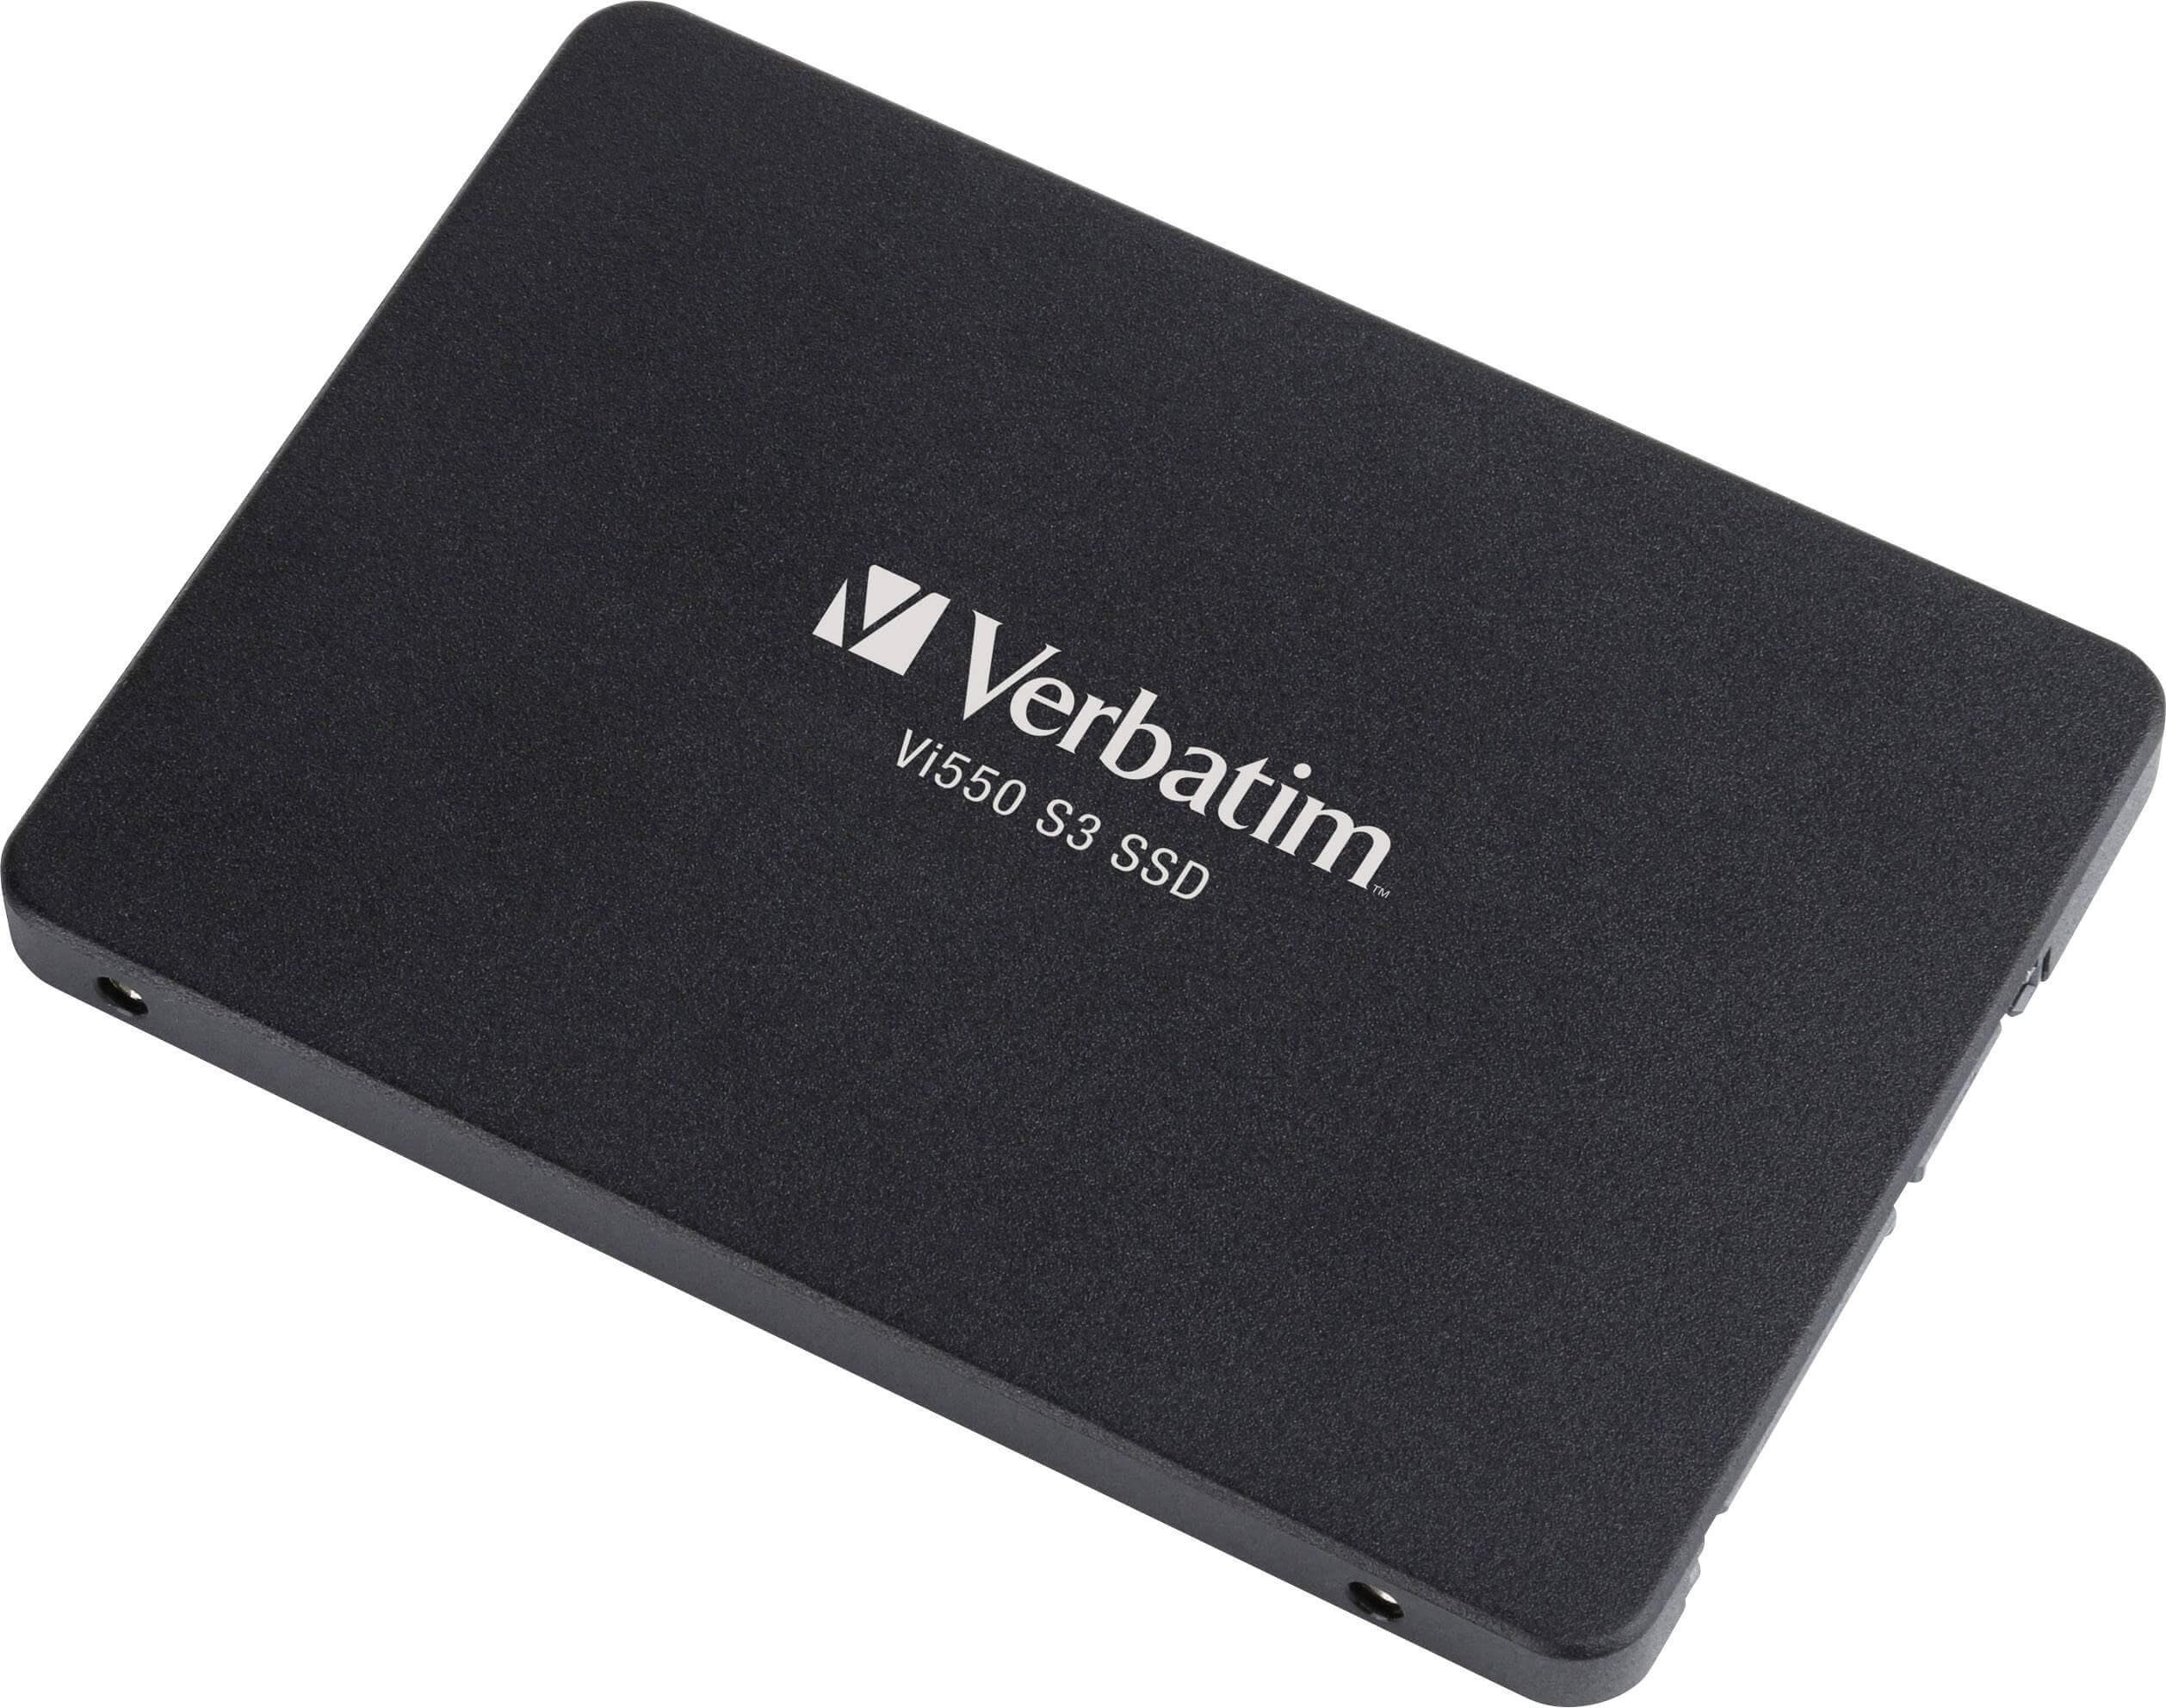 SSD VERBATIM VI550 128 GB 2.5